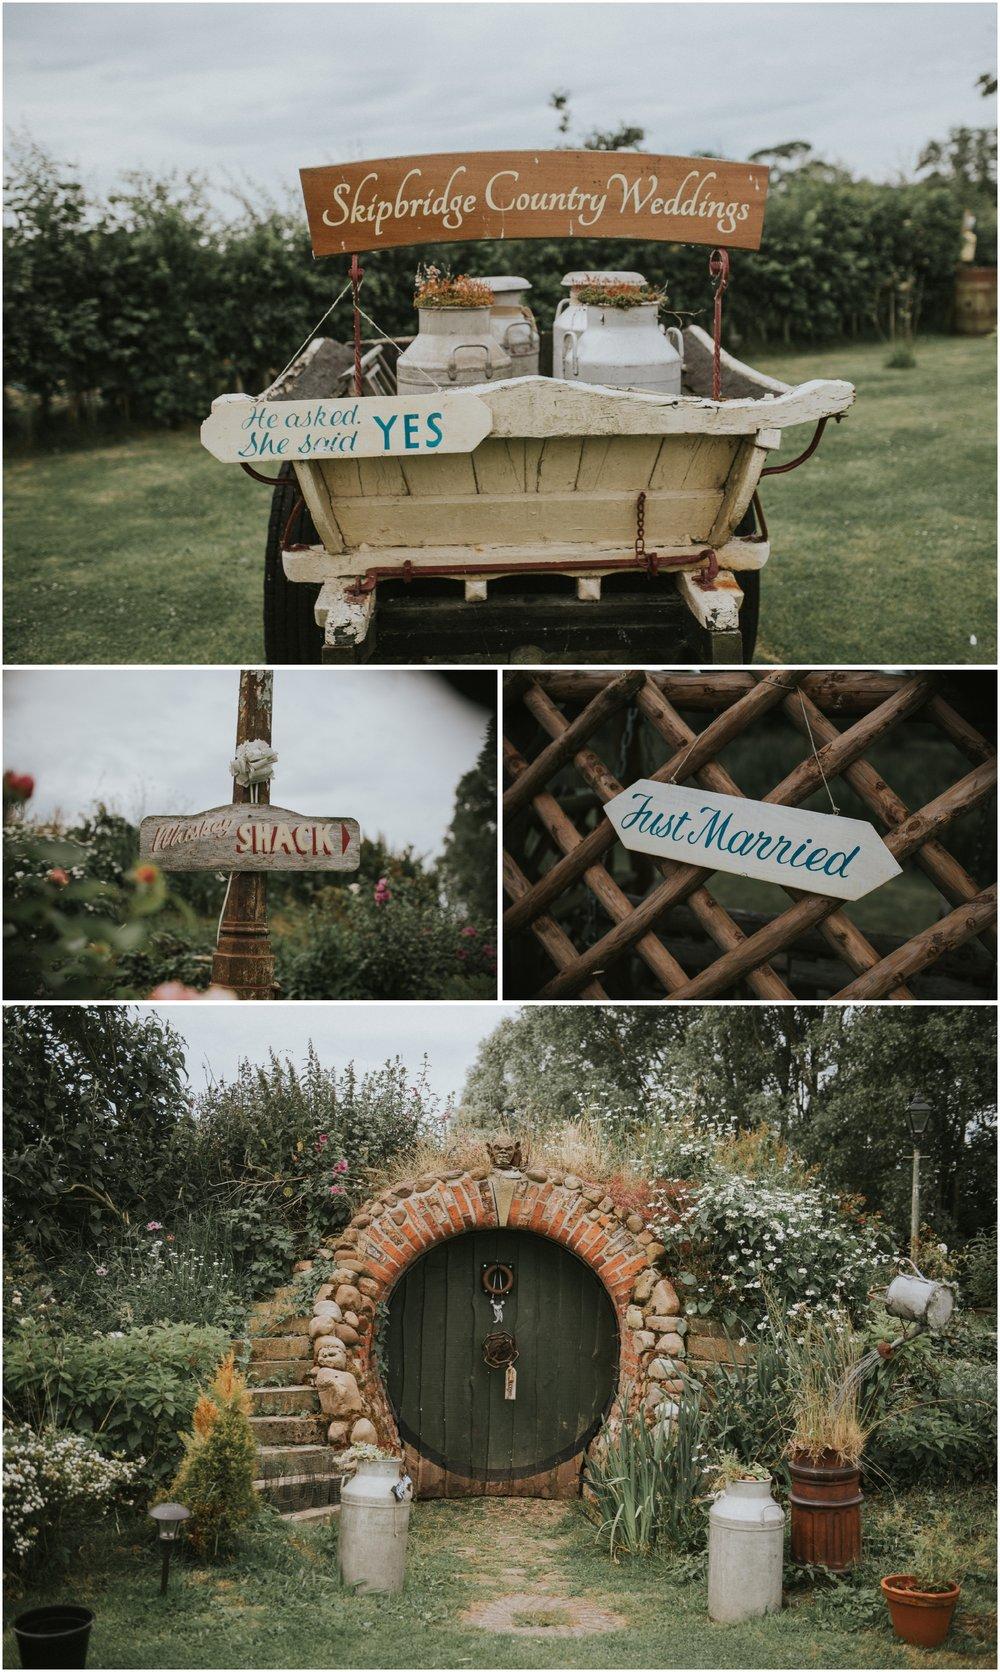 SkipbridegFarmWedding-LukeHolroyd-Yorkshirewedding_0001.jpg